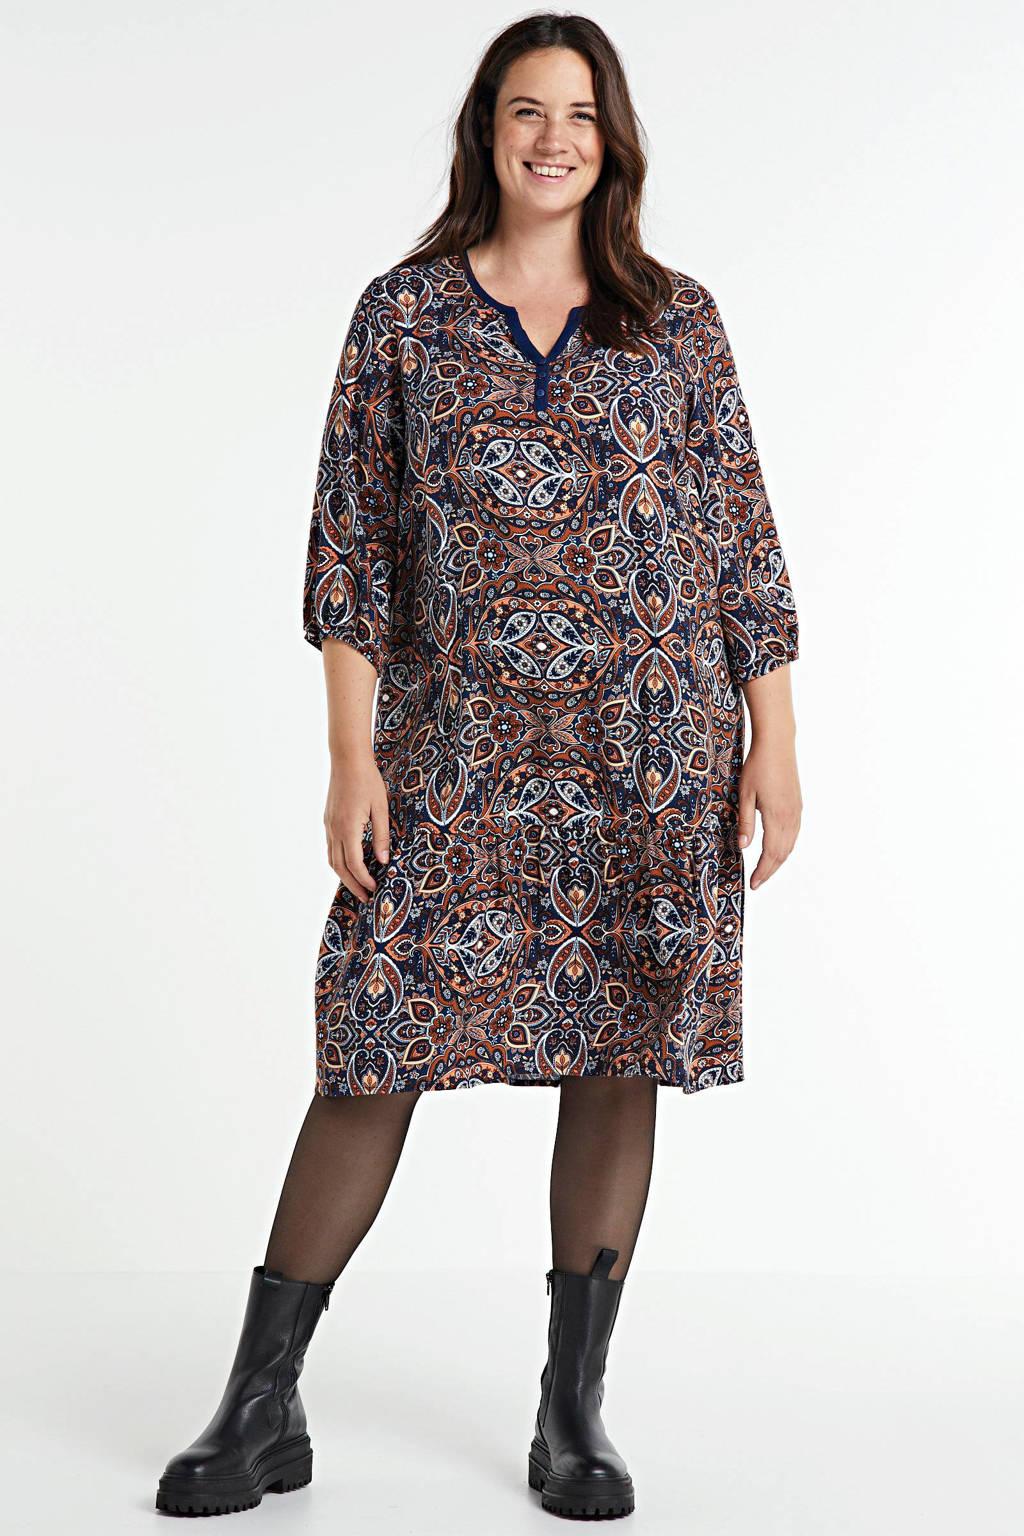 Ciso jurk met paisleyprint donkerblauw/rood/oranje, Donkerblauw/rood/oranje